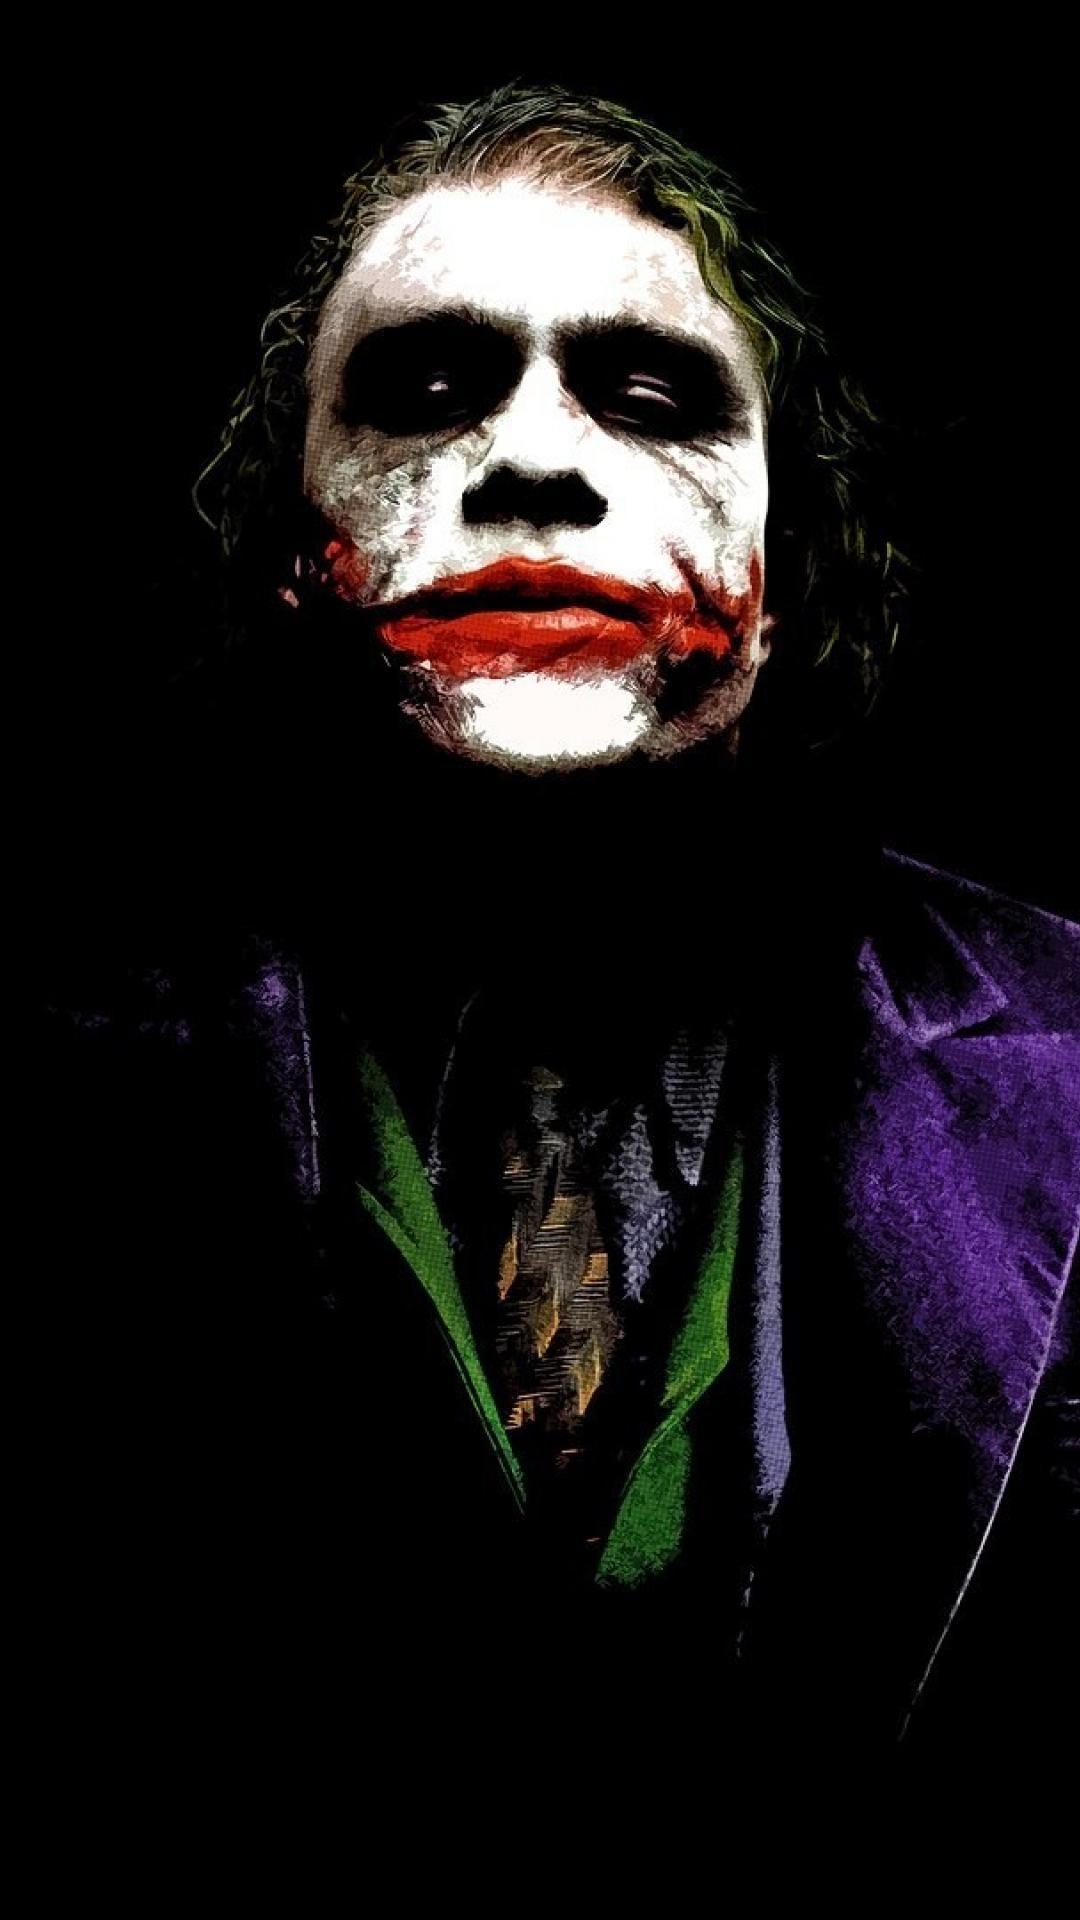 1080x1920 New Iphone Wallpaper Iphone Wallpaper Heath Ledger Joker Wallpaper Joker Wallpaper Joker Iphone Wallpaper